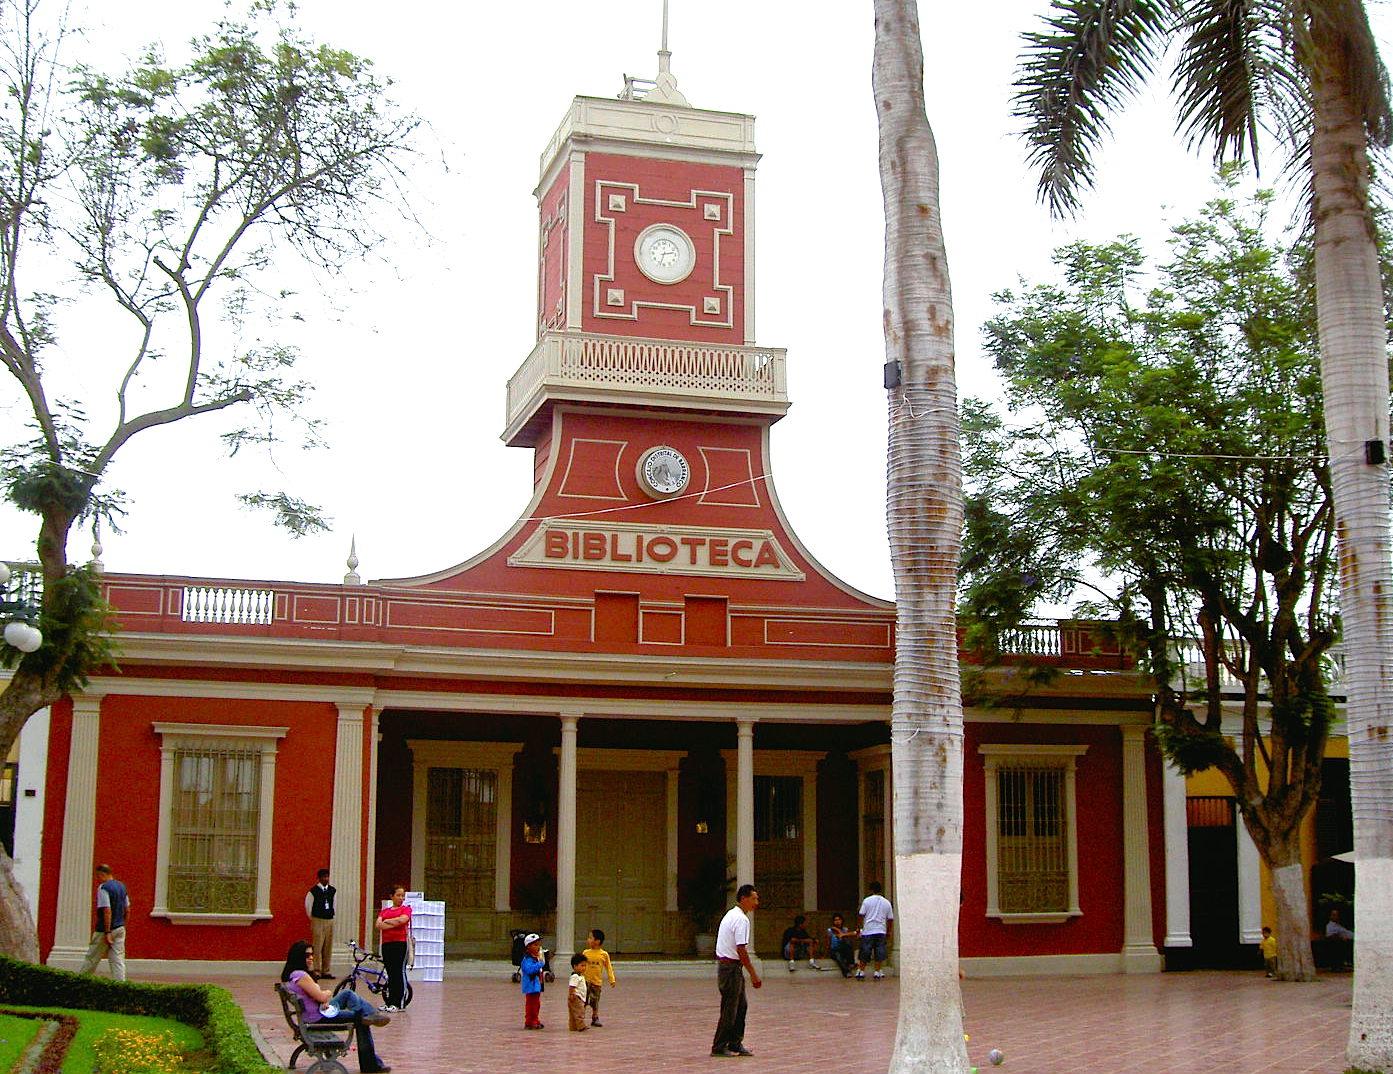 Barranco Old City Hall